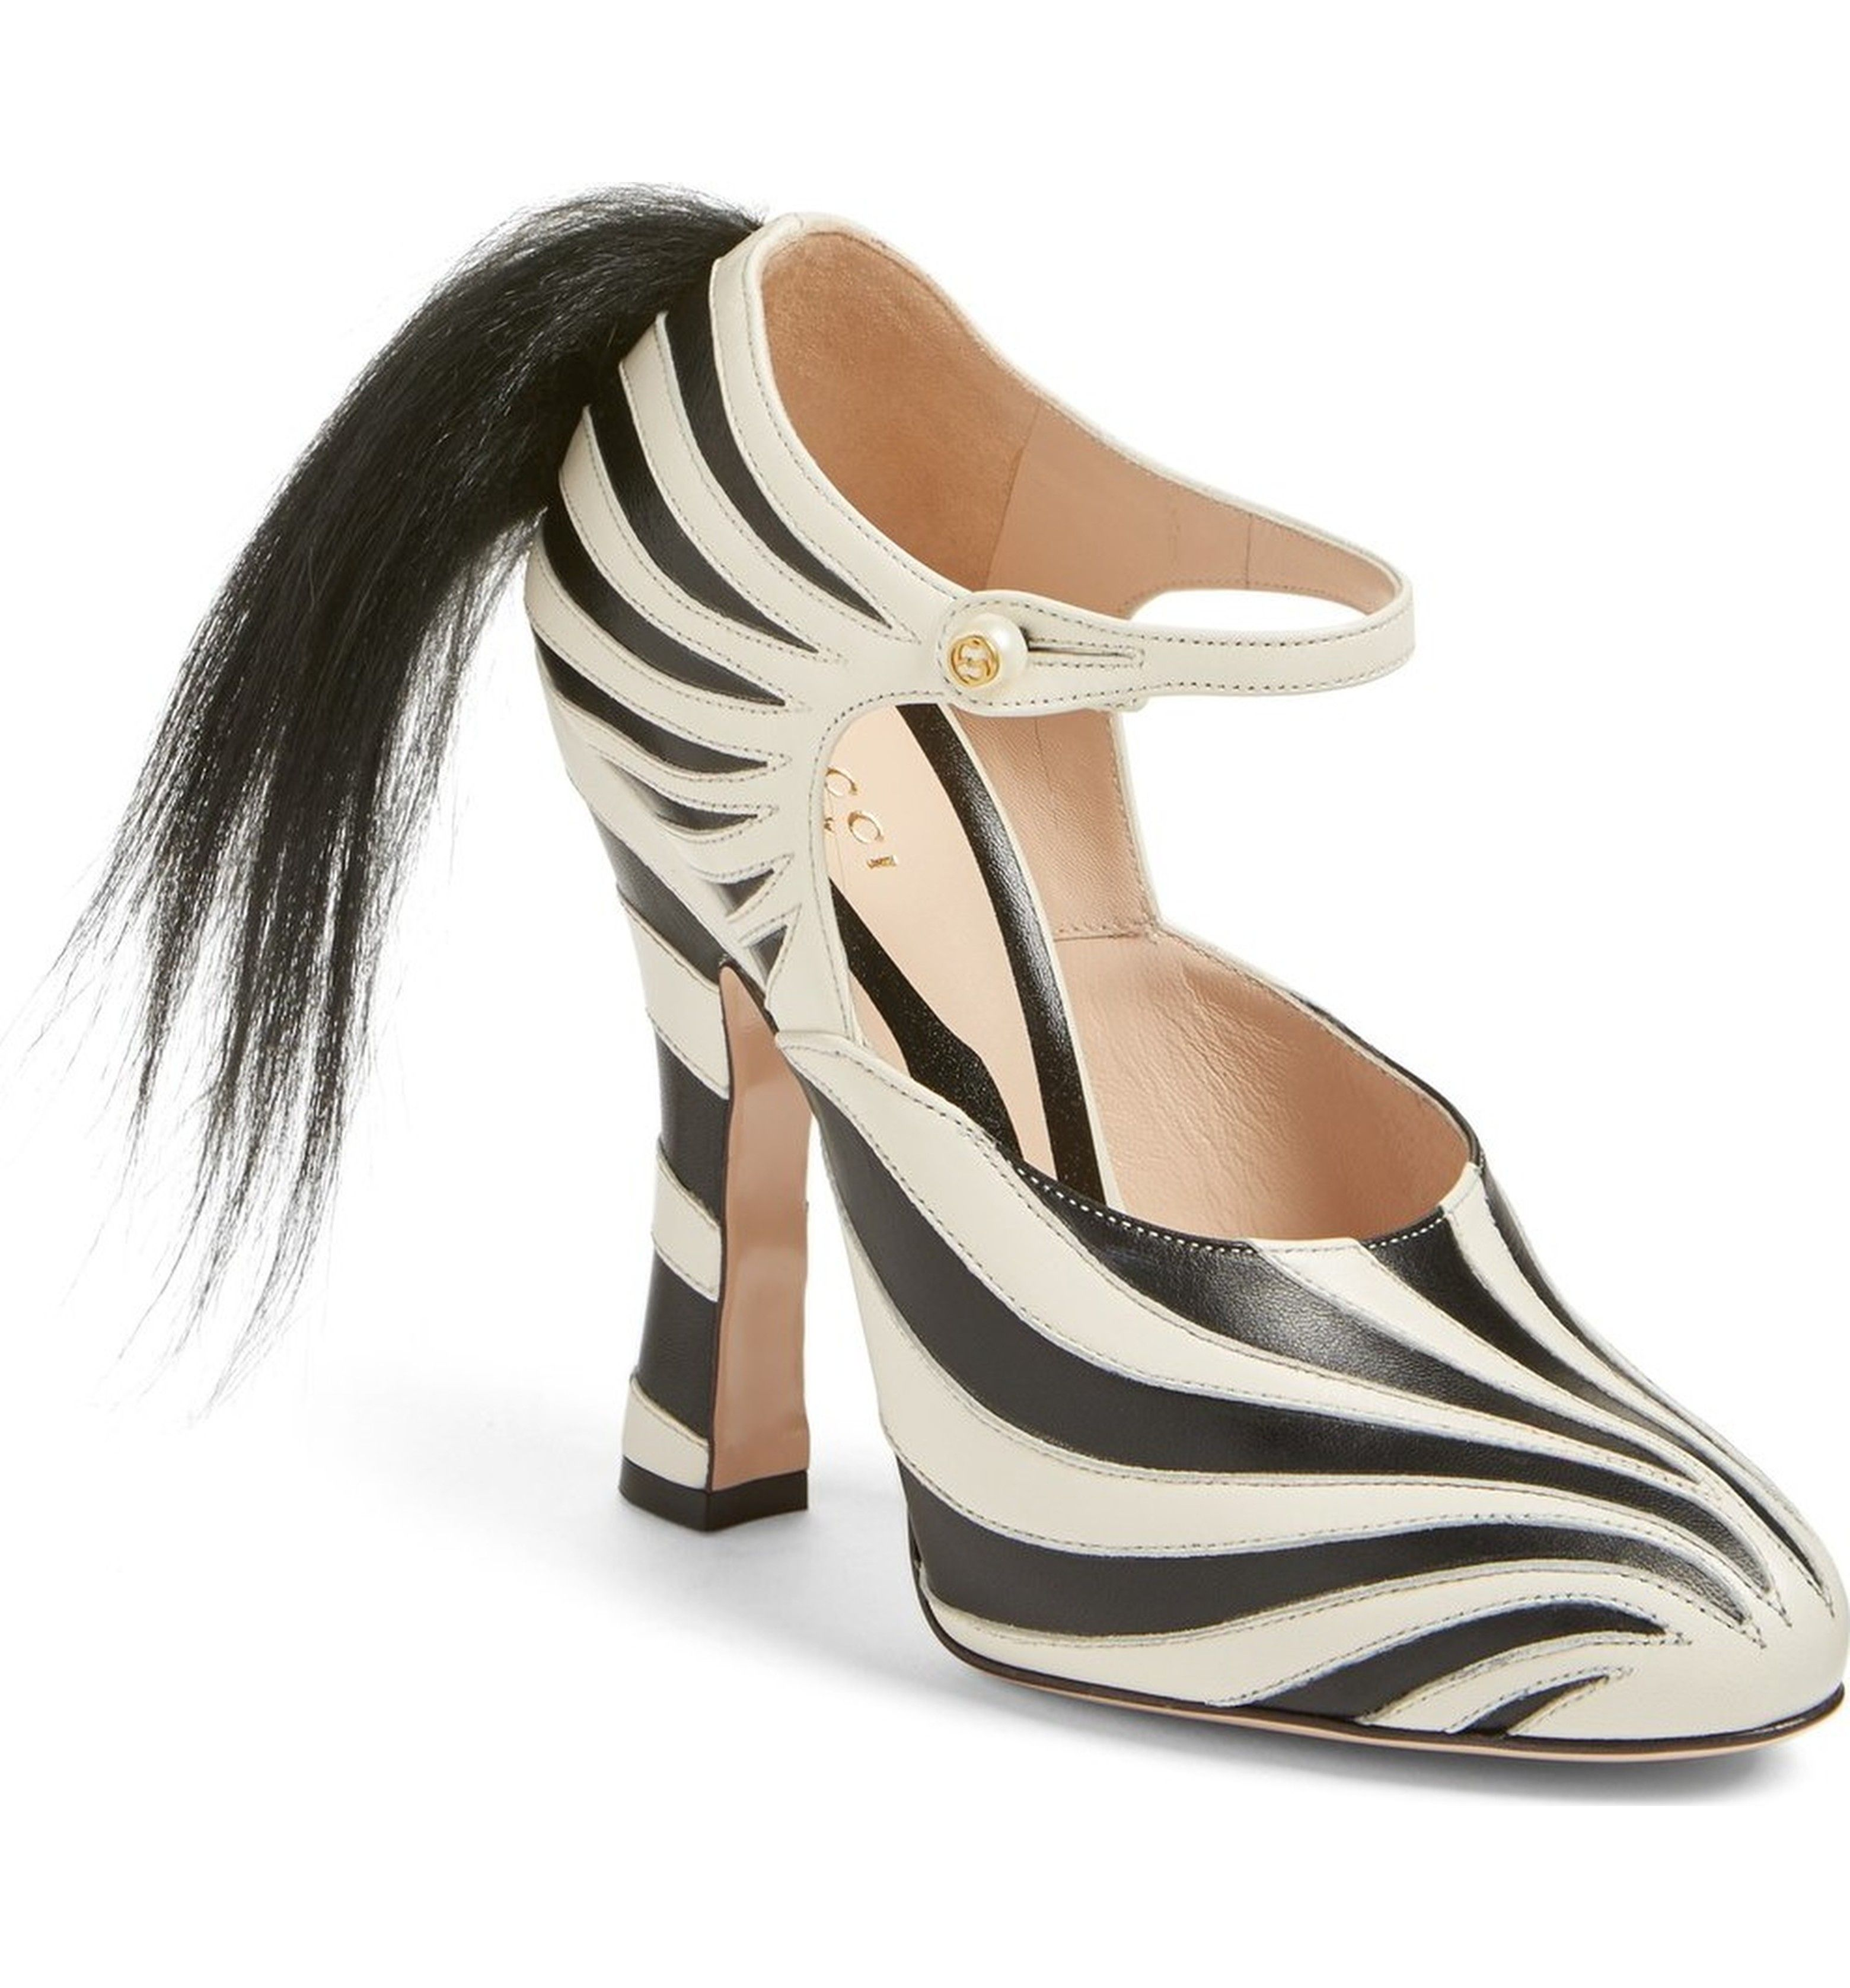 Main Image - Gucci 'Lesley' Zebra Stripe Pump (Women)